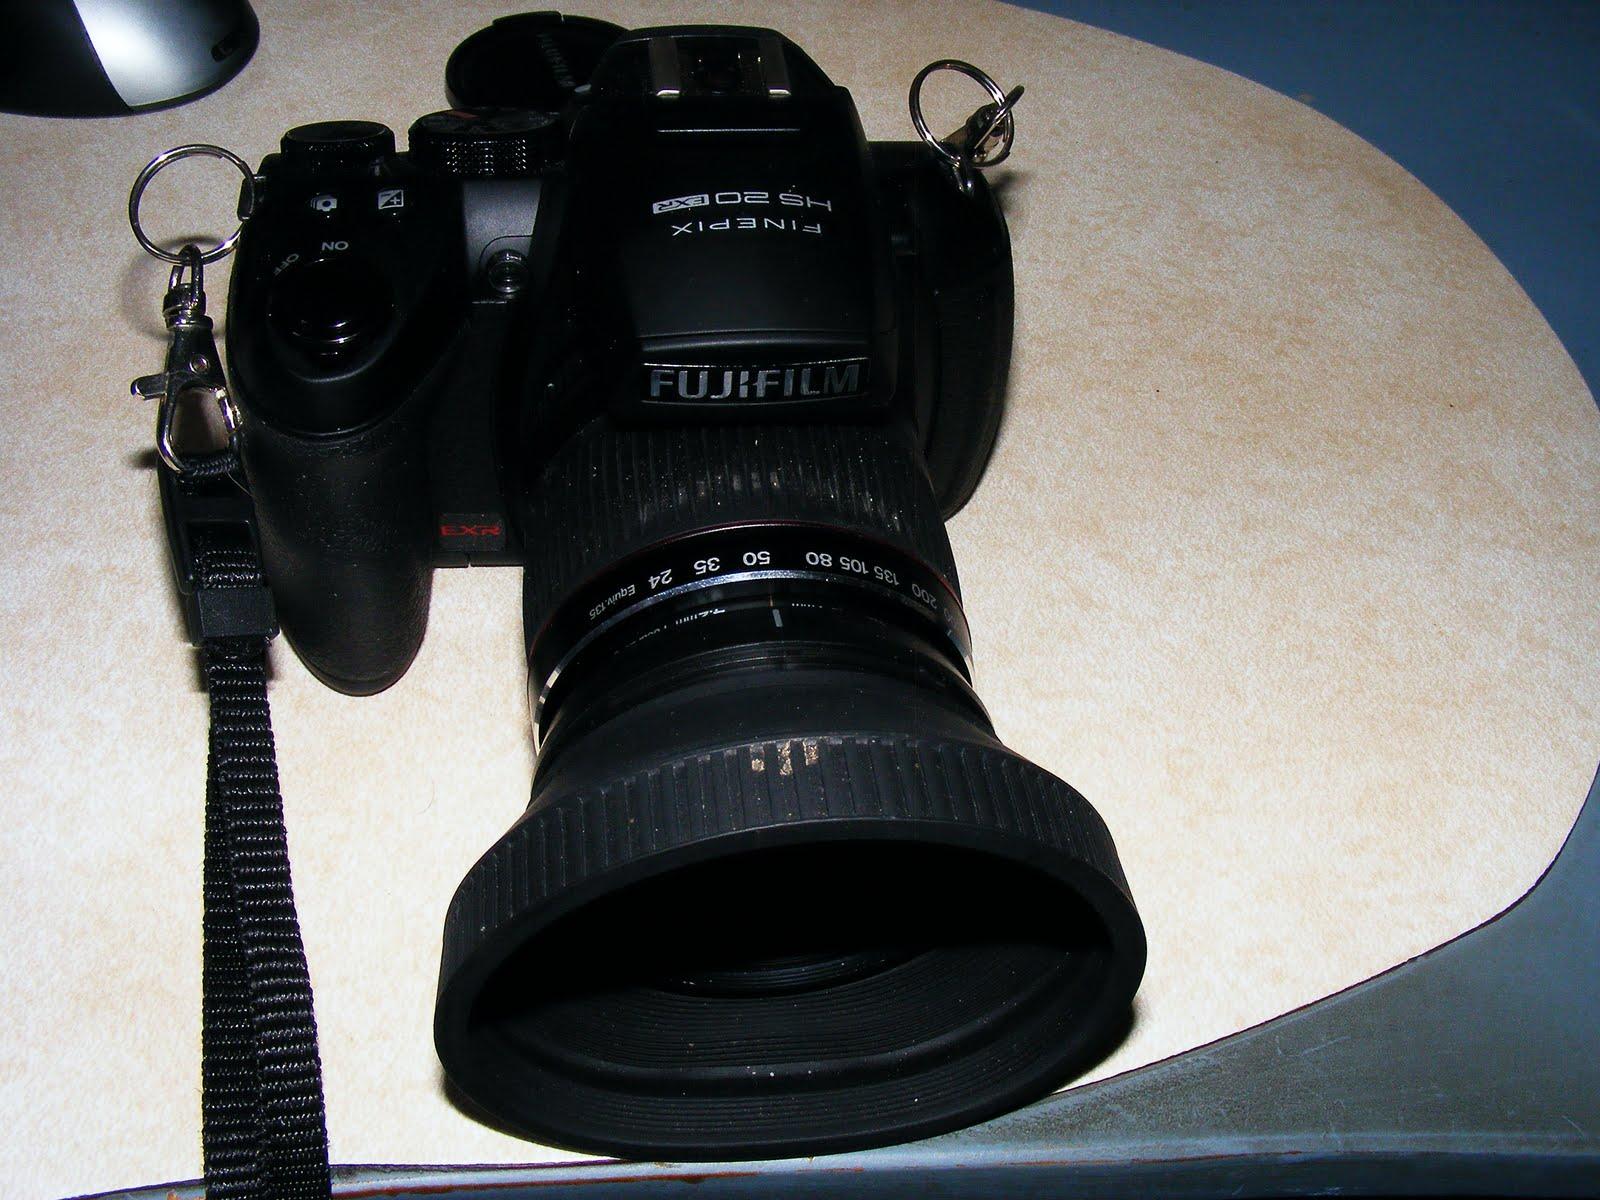 a kiwi retrospective fuji hs20exr review pt 10 manual mode rh akiwiretrospective blogspot com Photography Manual Focus Manual Focus Cameras